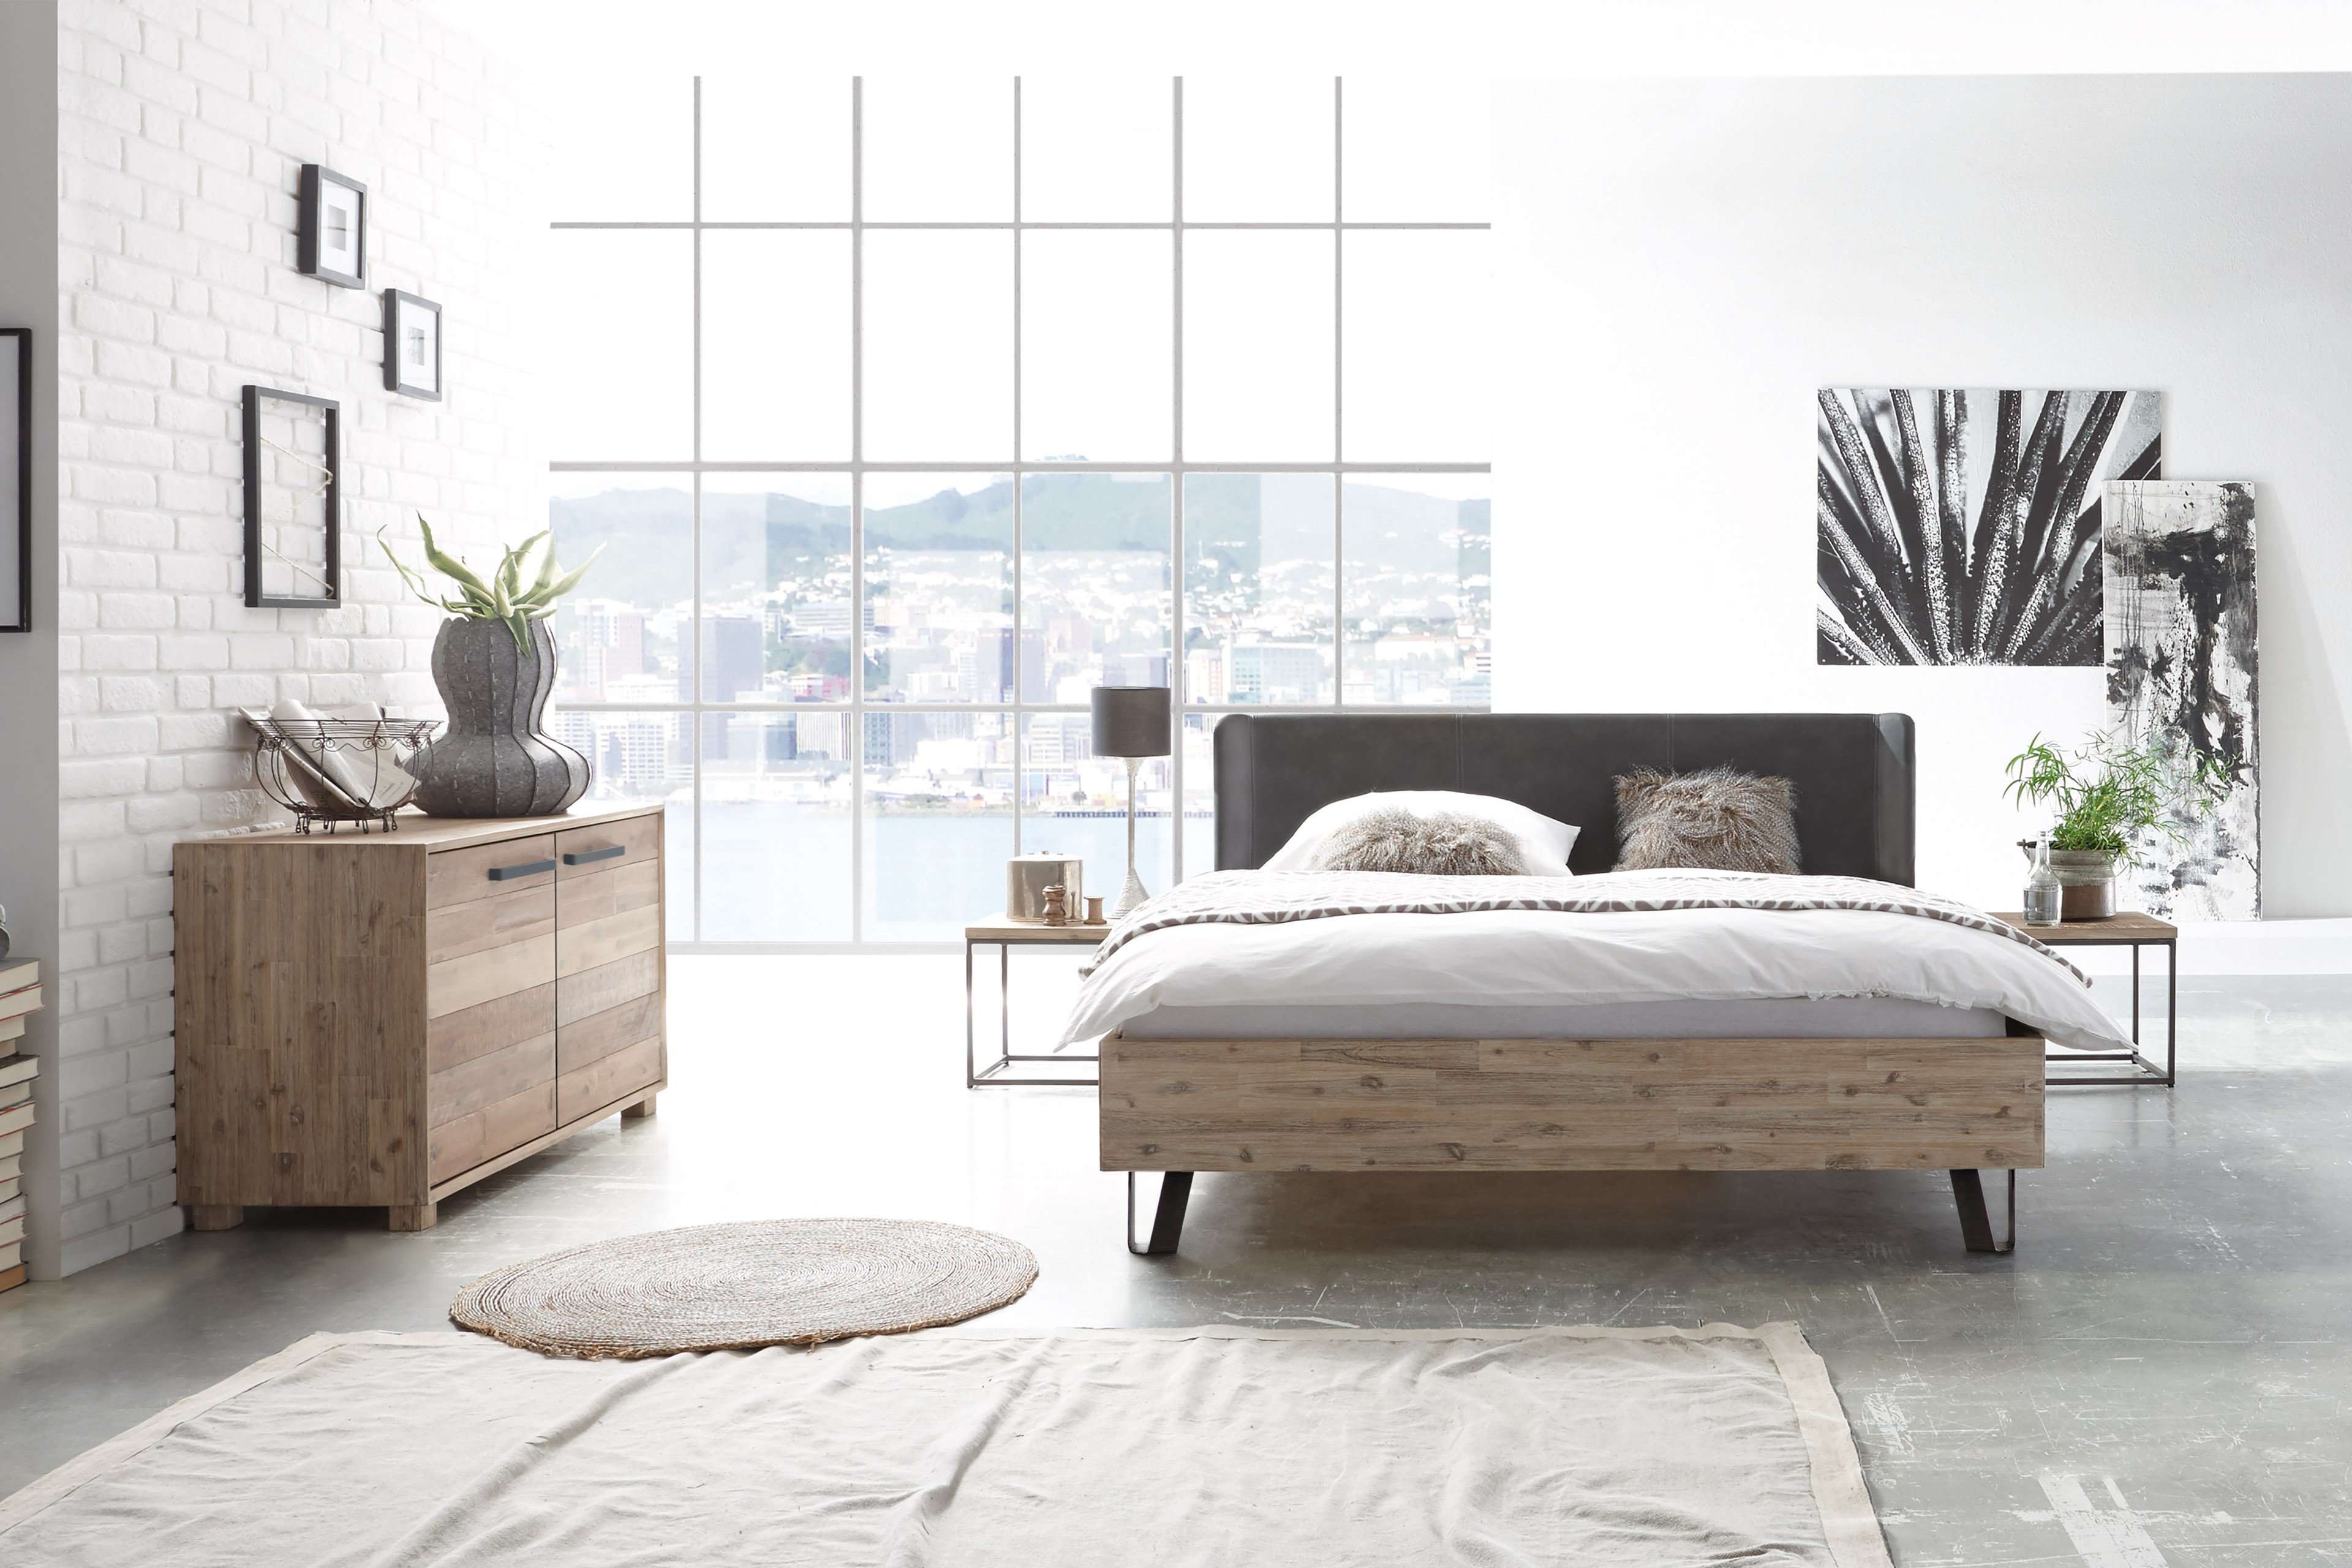 factory chic hasena bett industrial stil m bel letz. Black Bedroom Furniture Sets. Home Design Ideas